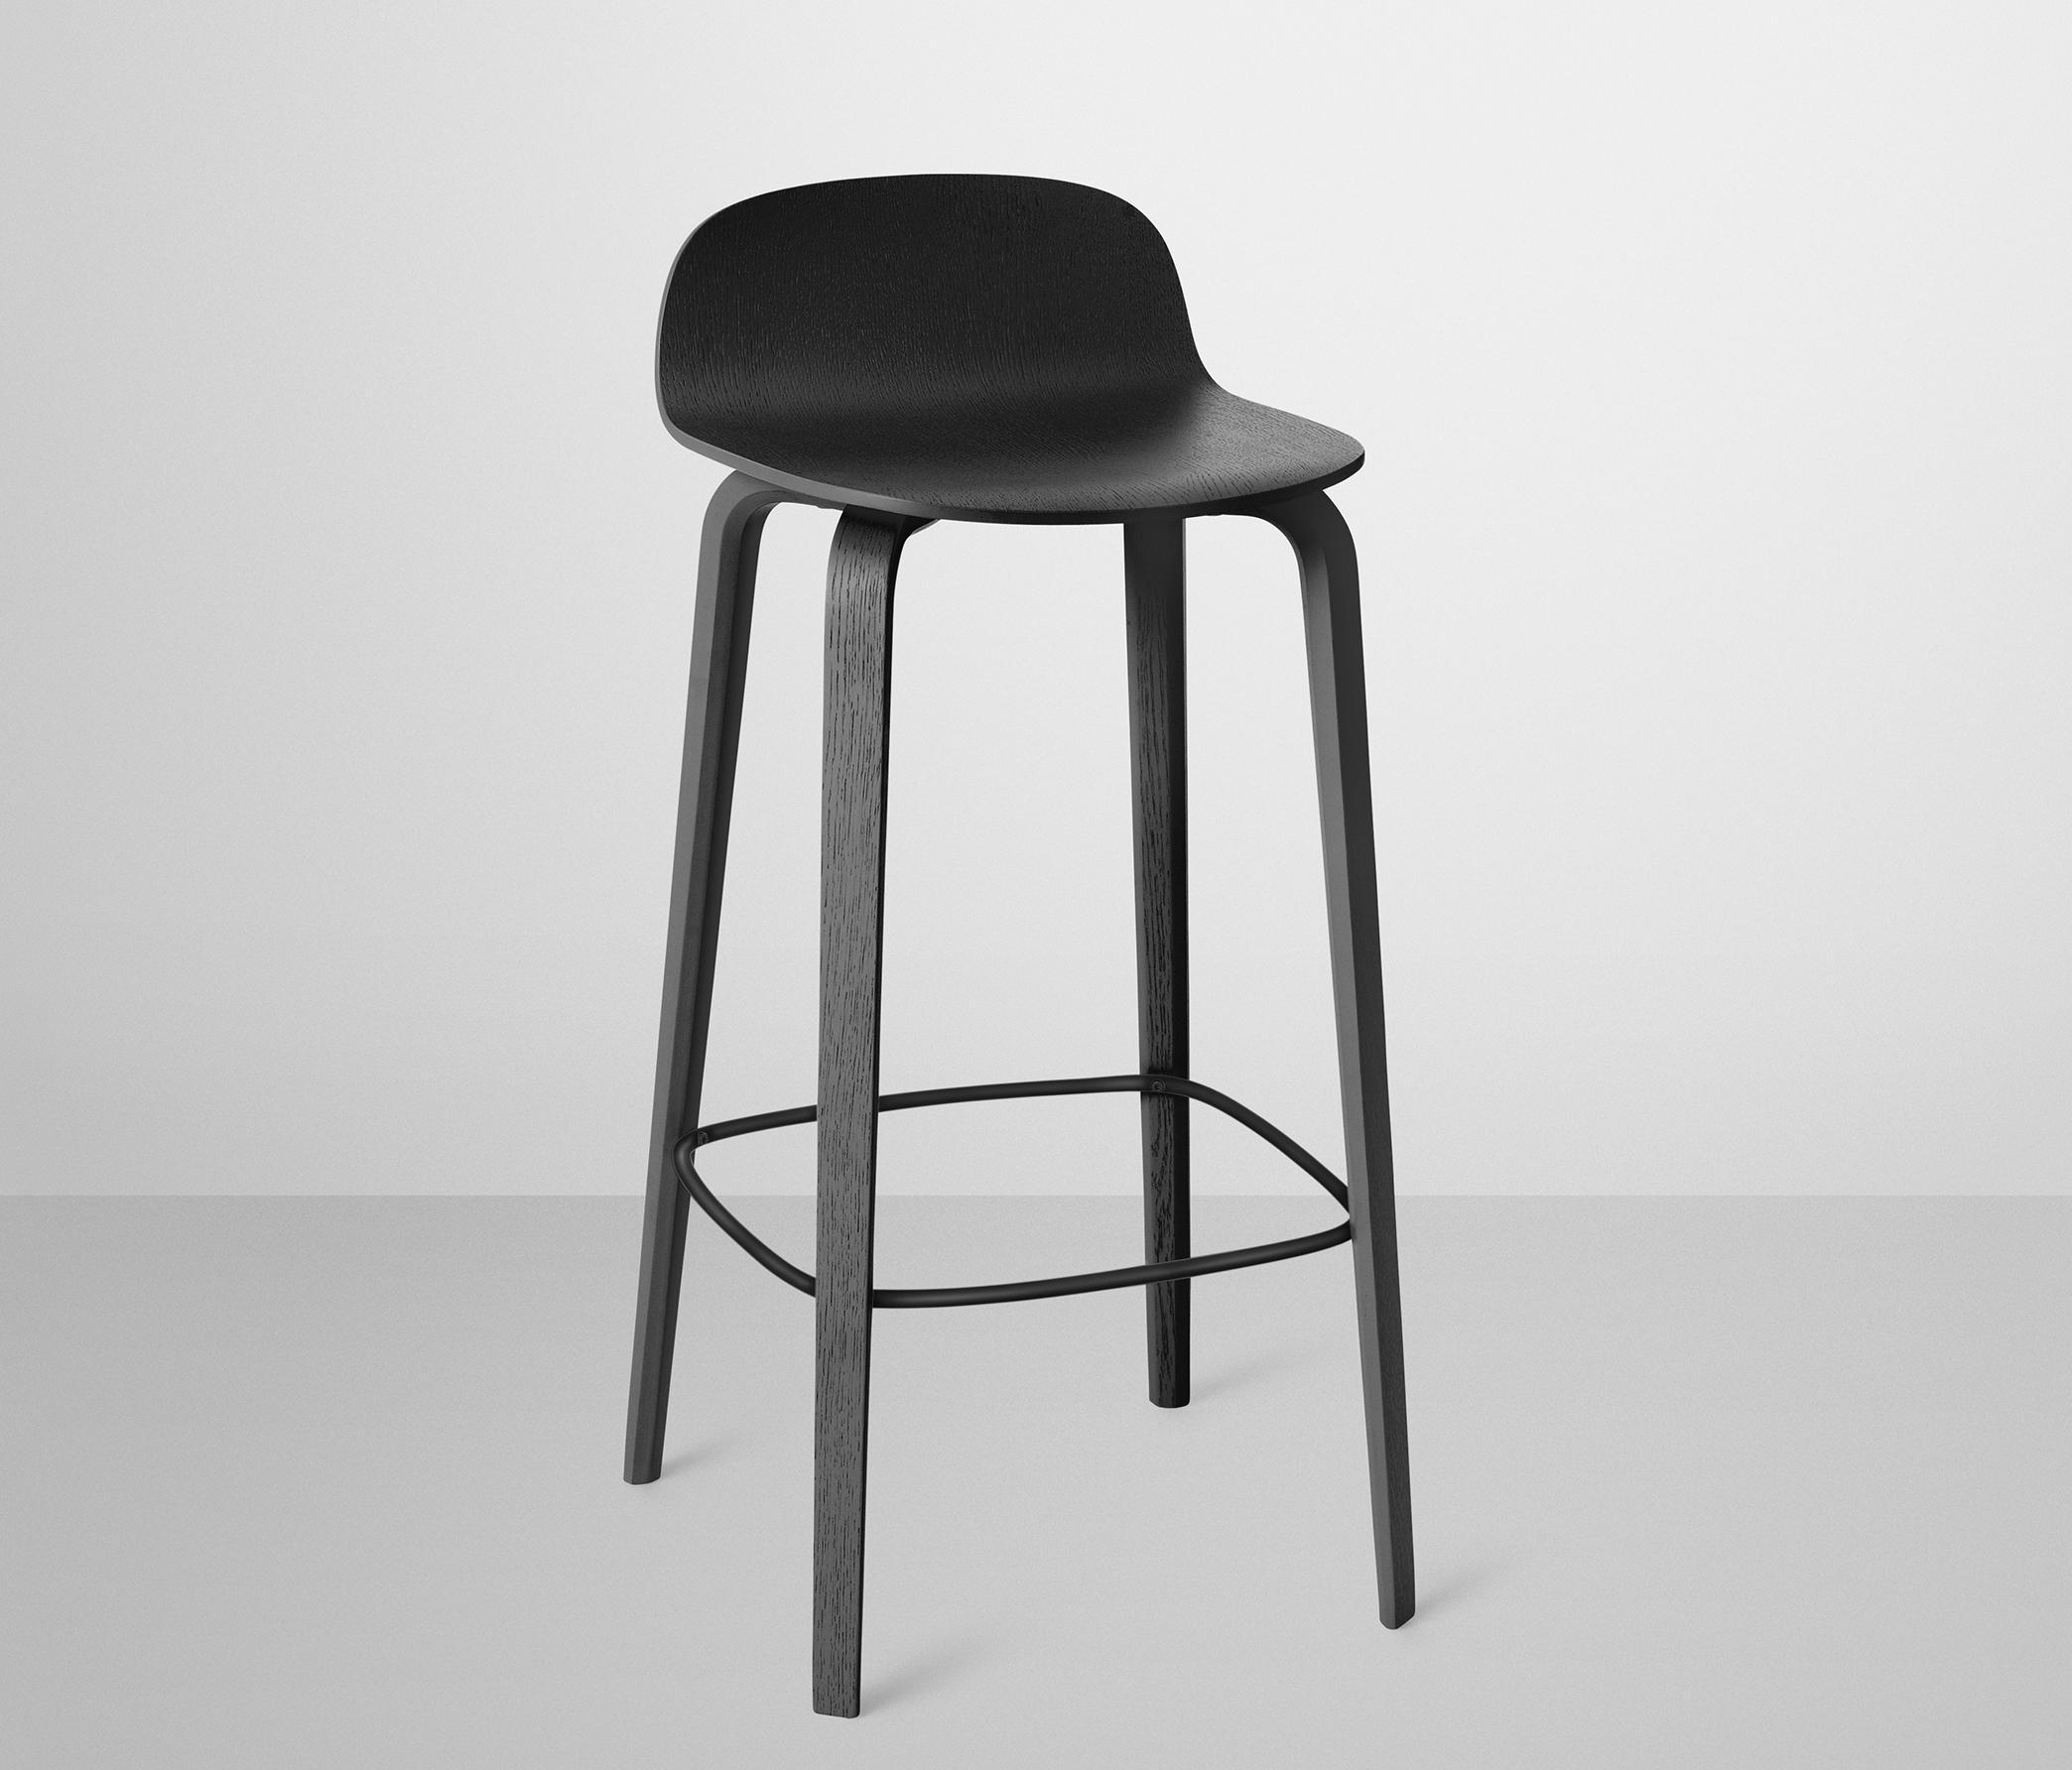 high bar stool chairs swing chair b&q visu stools from muuto architonic